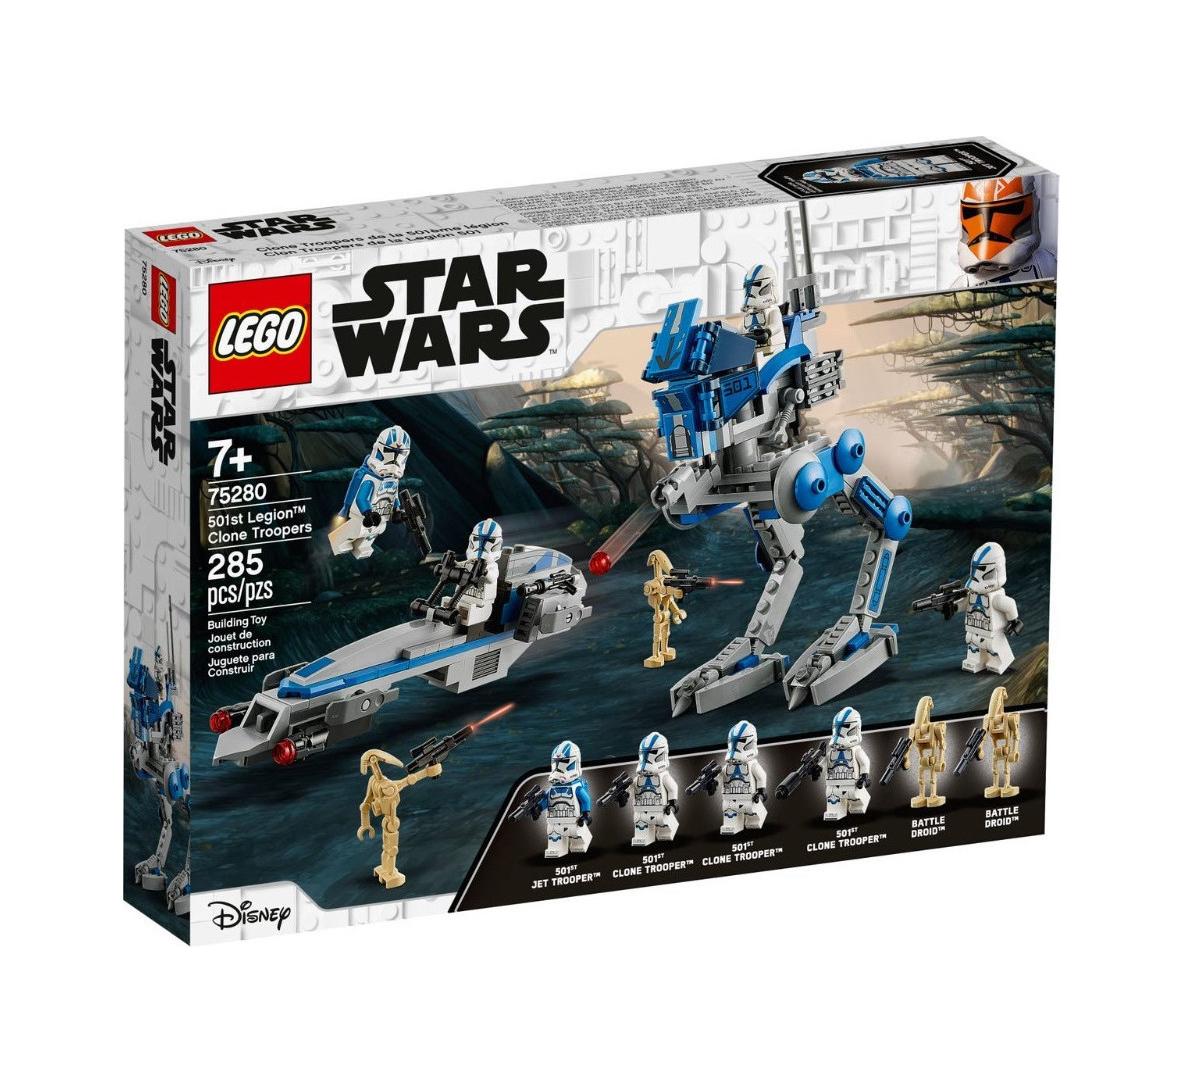 Lego Star Wars: 501st Legion Clone Troopers 75280